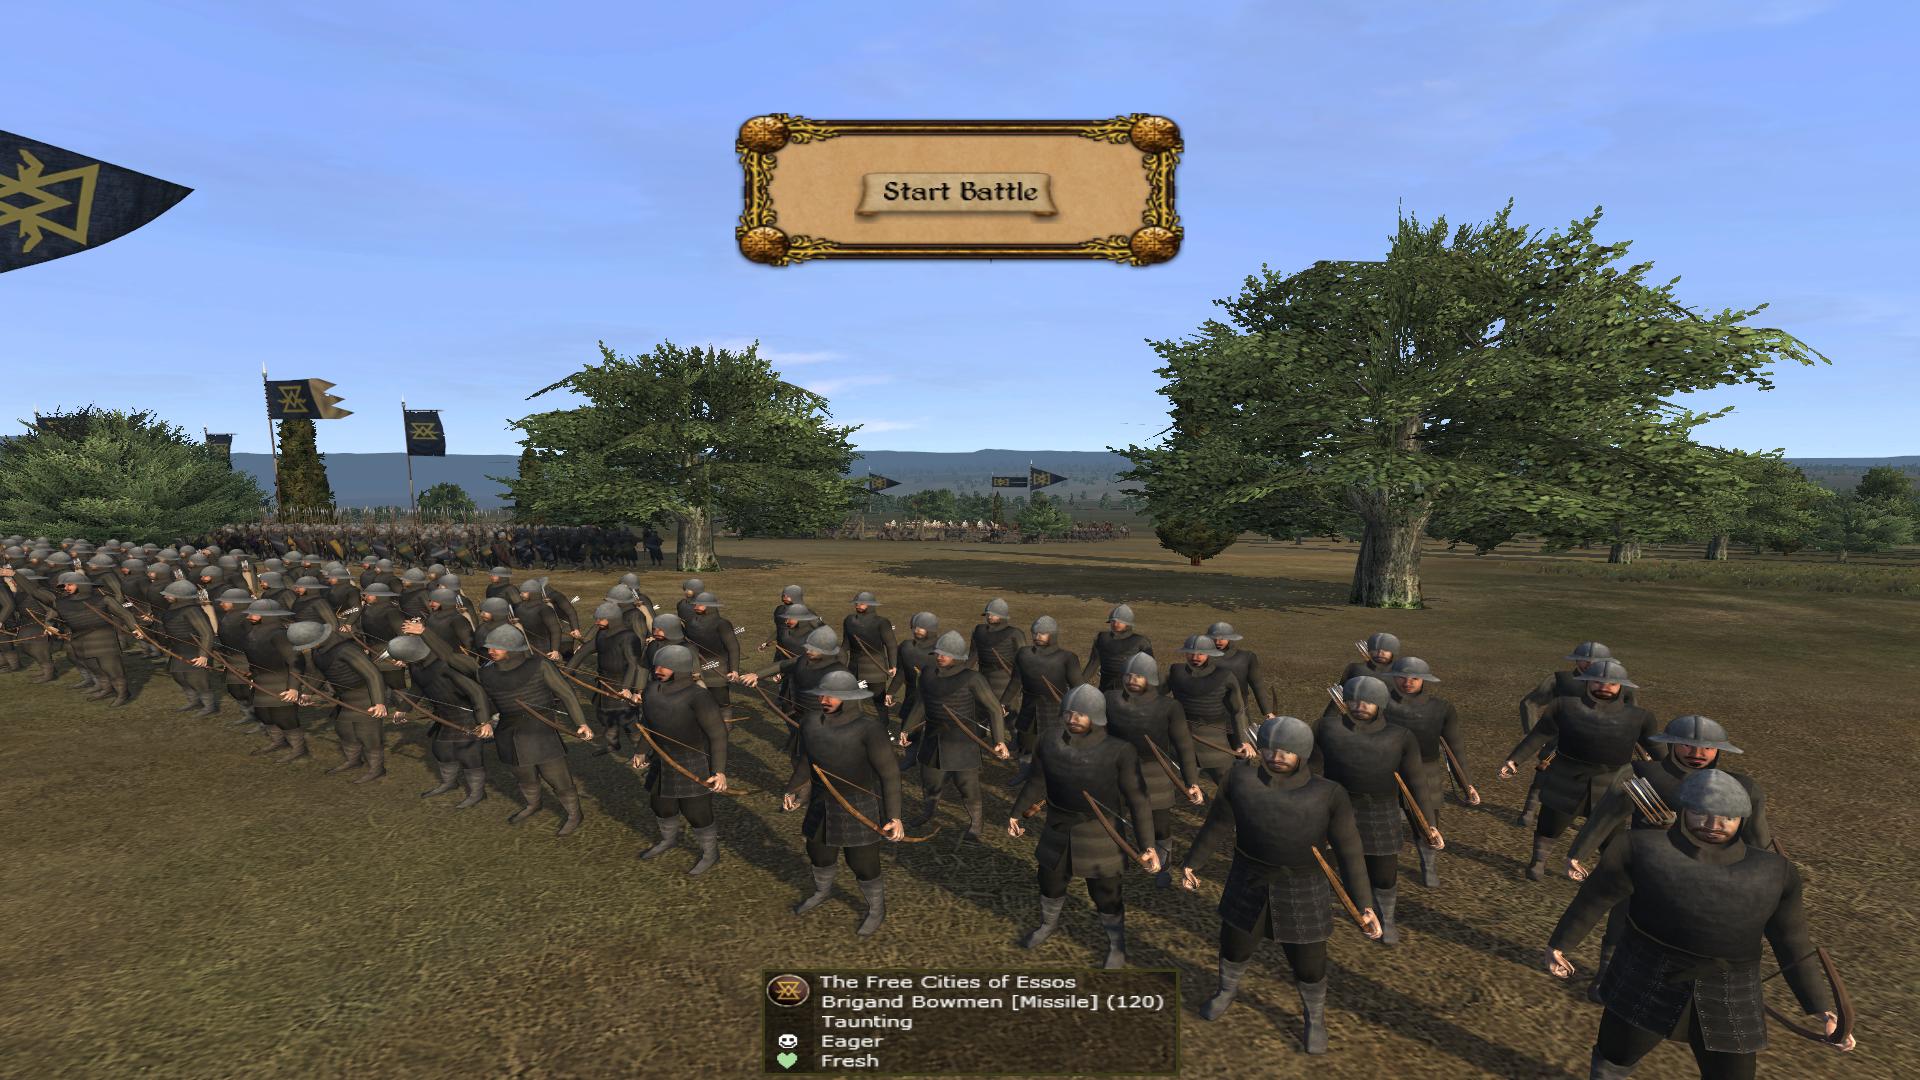 Brigand Bowmen of the Free Cities of Essos.